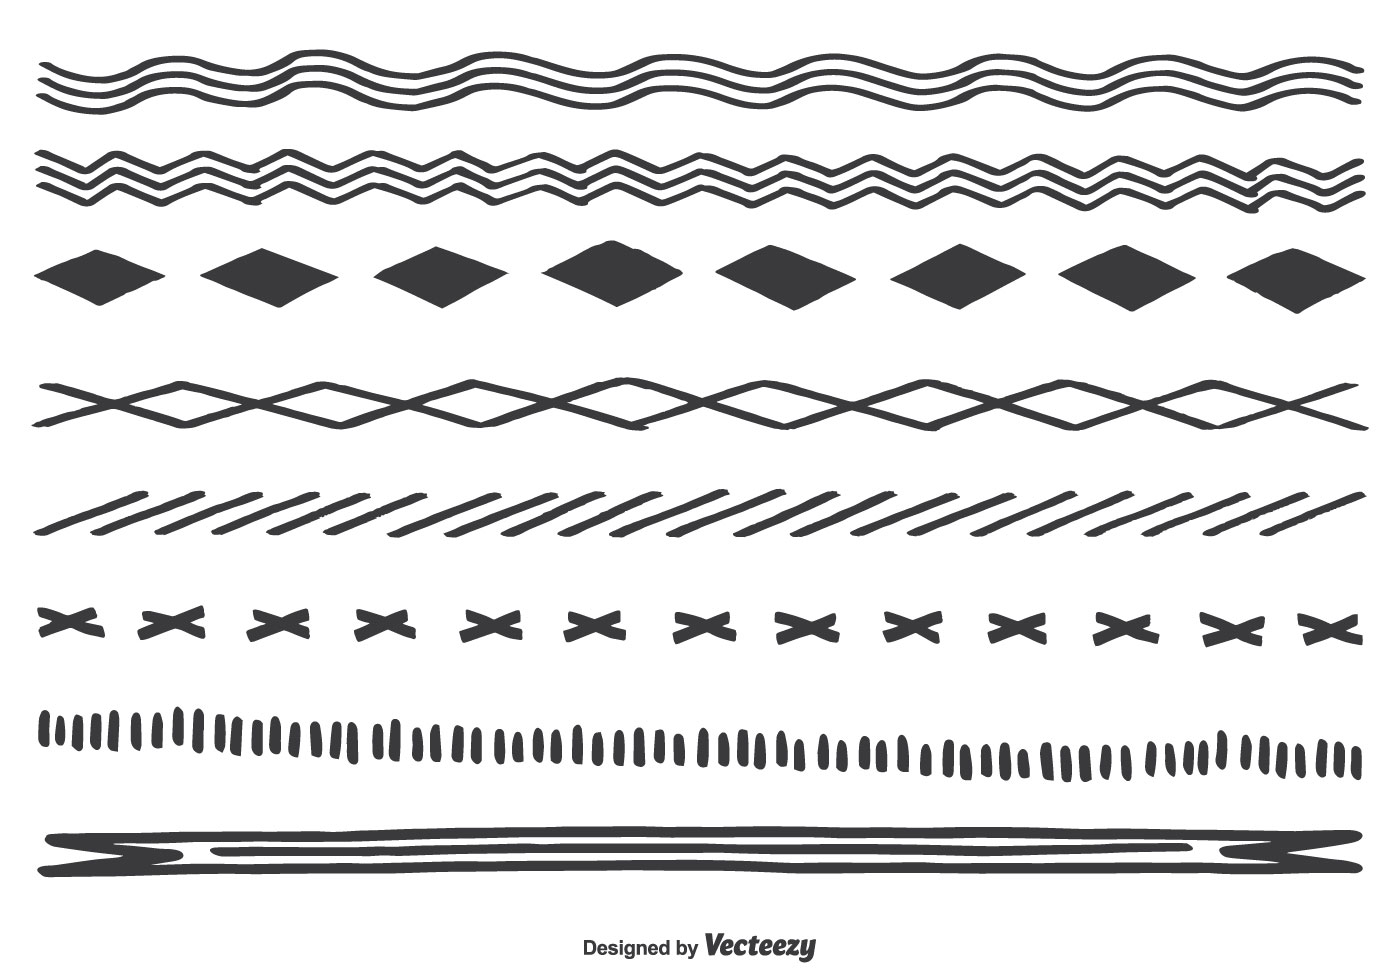 Cute Hand Drawn Borders - Download Free Vector Art, Stock ...